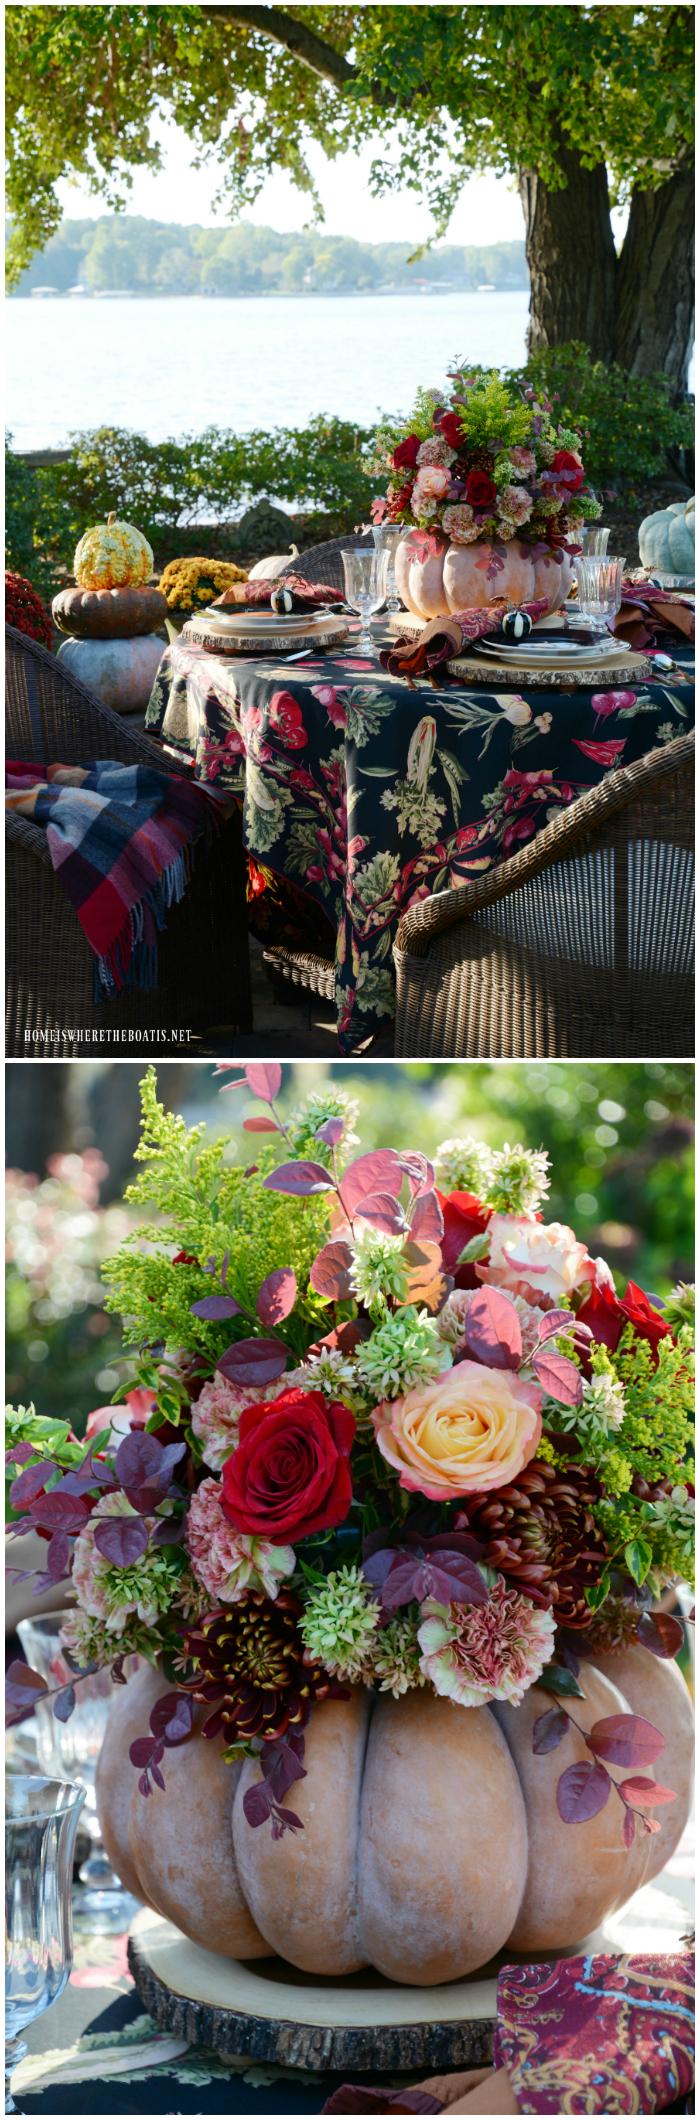 DIY Blooming Pumpkin the EASY Way and Autumn Table | ©homeiswheretheboatis.net #pumpkinvase #flowers #fall #centerpiece #pumpkin | ©homeiswheretheboatis.net #fall #tablescapes #centerpiece #alfresco #pumpkin #lake